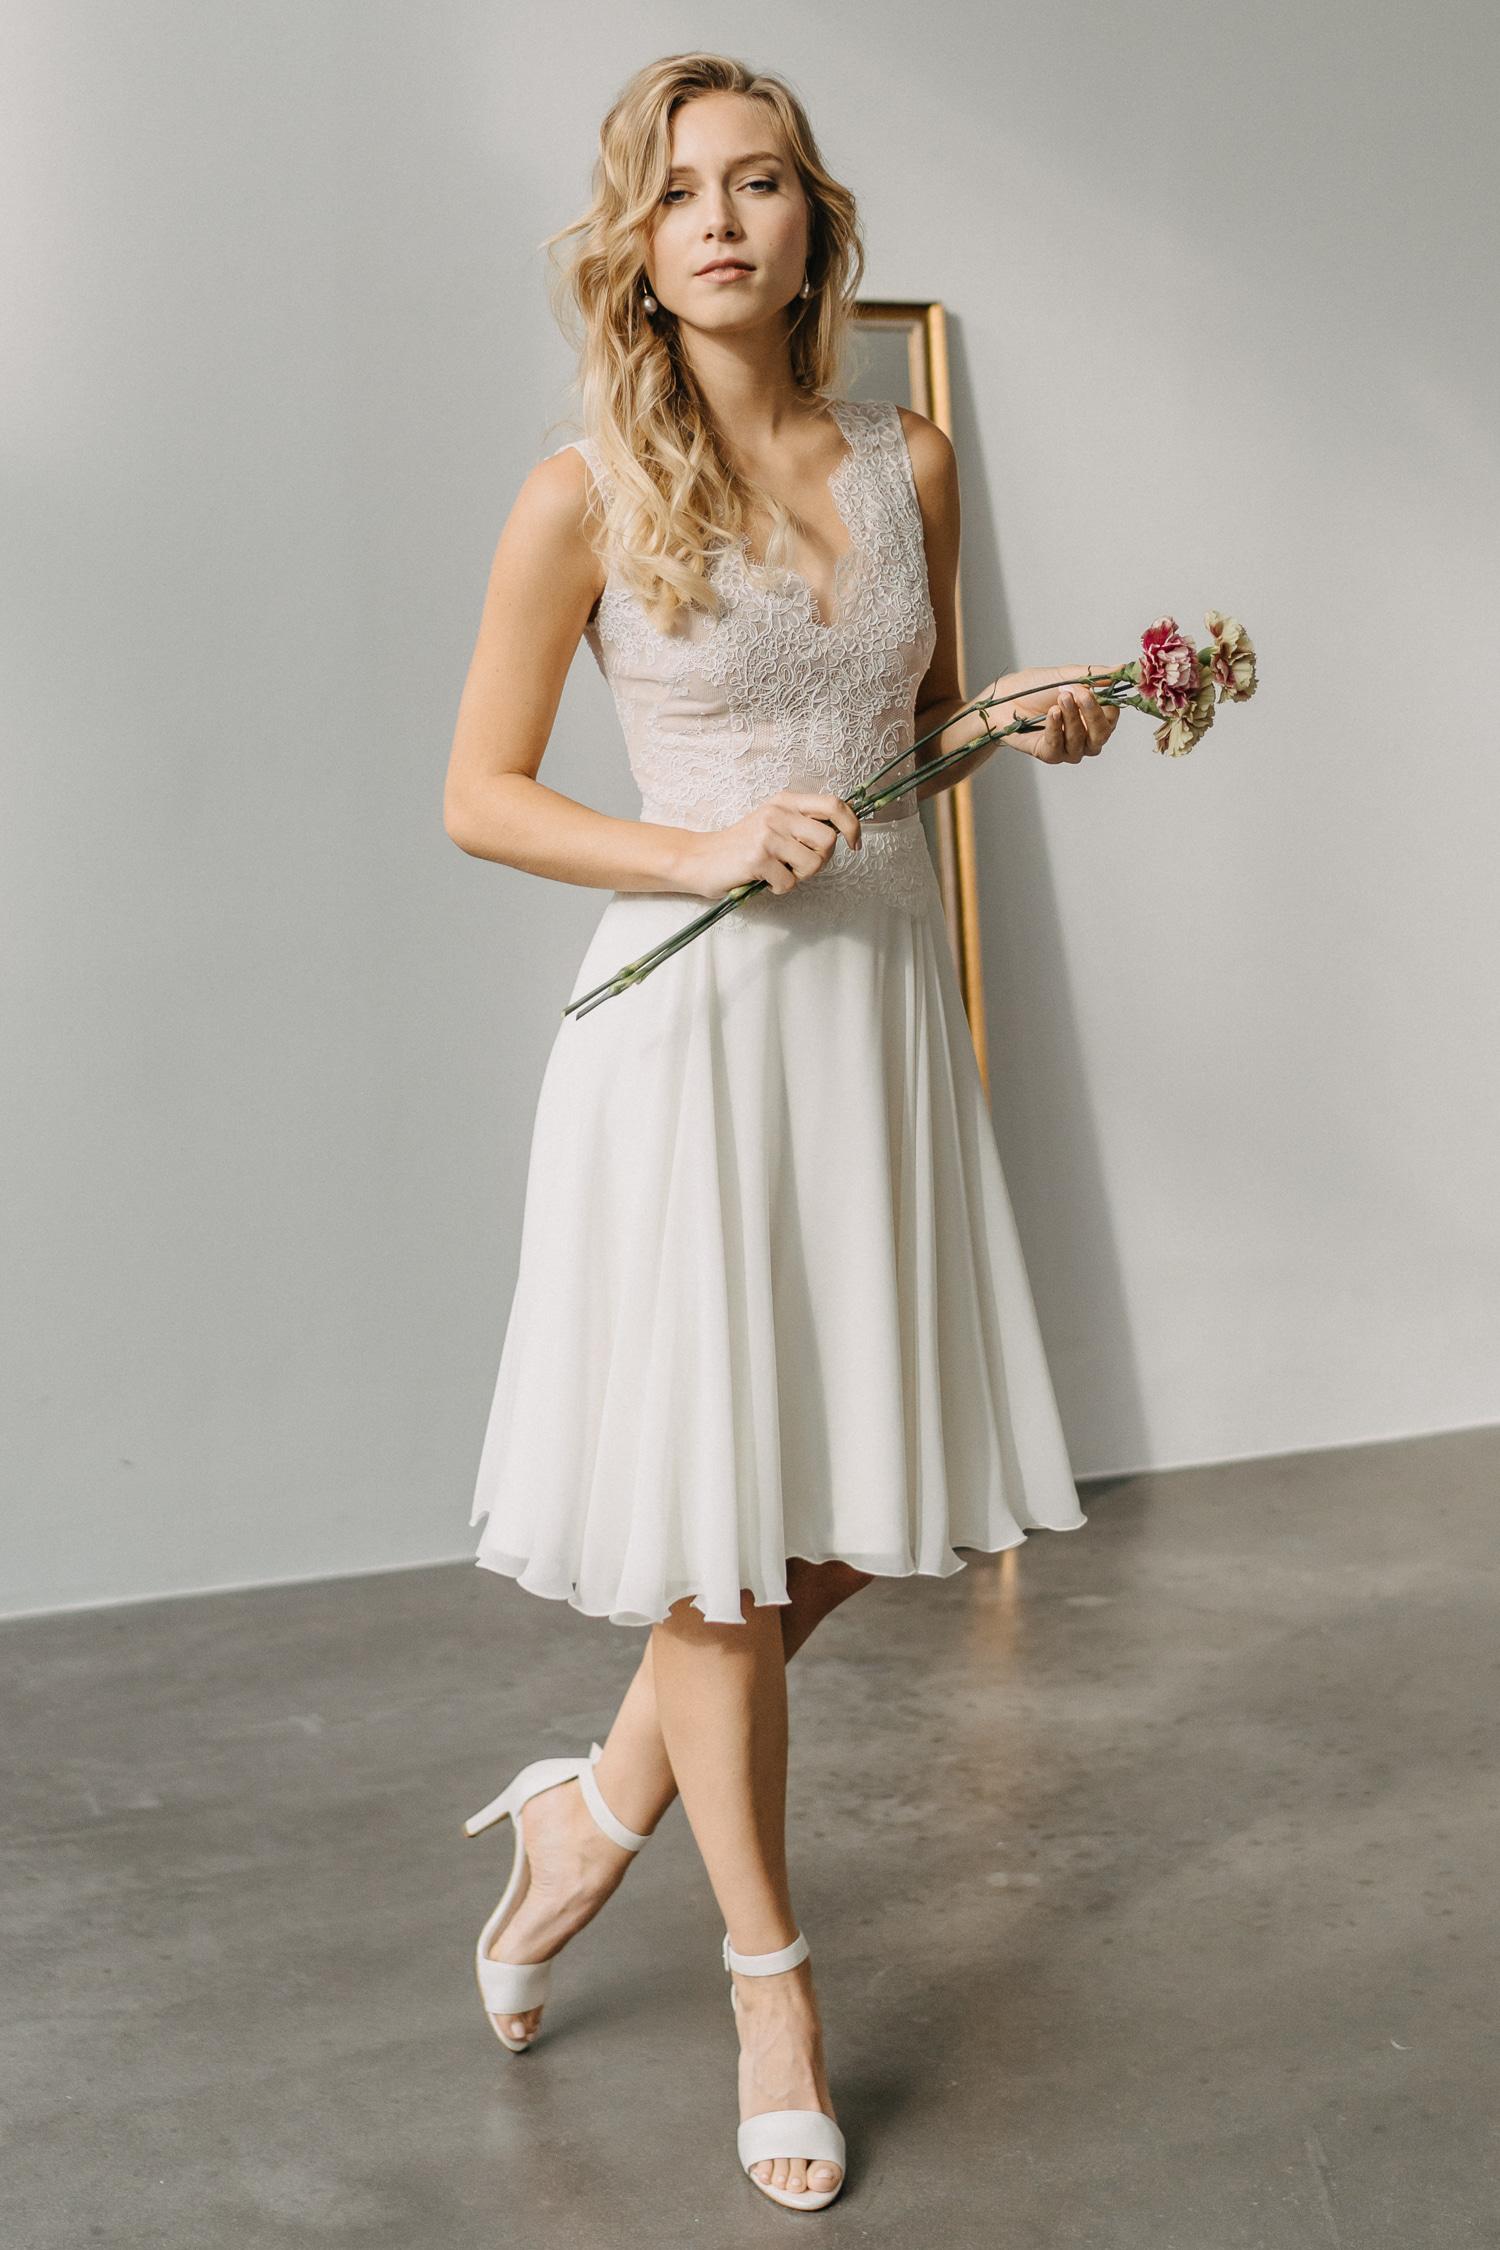 2021 Claudia Heller Brautmode Brautkleid Lilli 8 – gesehen bei frauimmer-herrewig.de